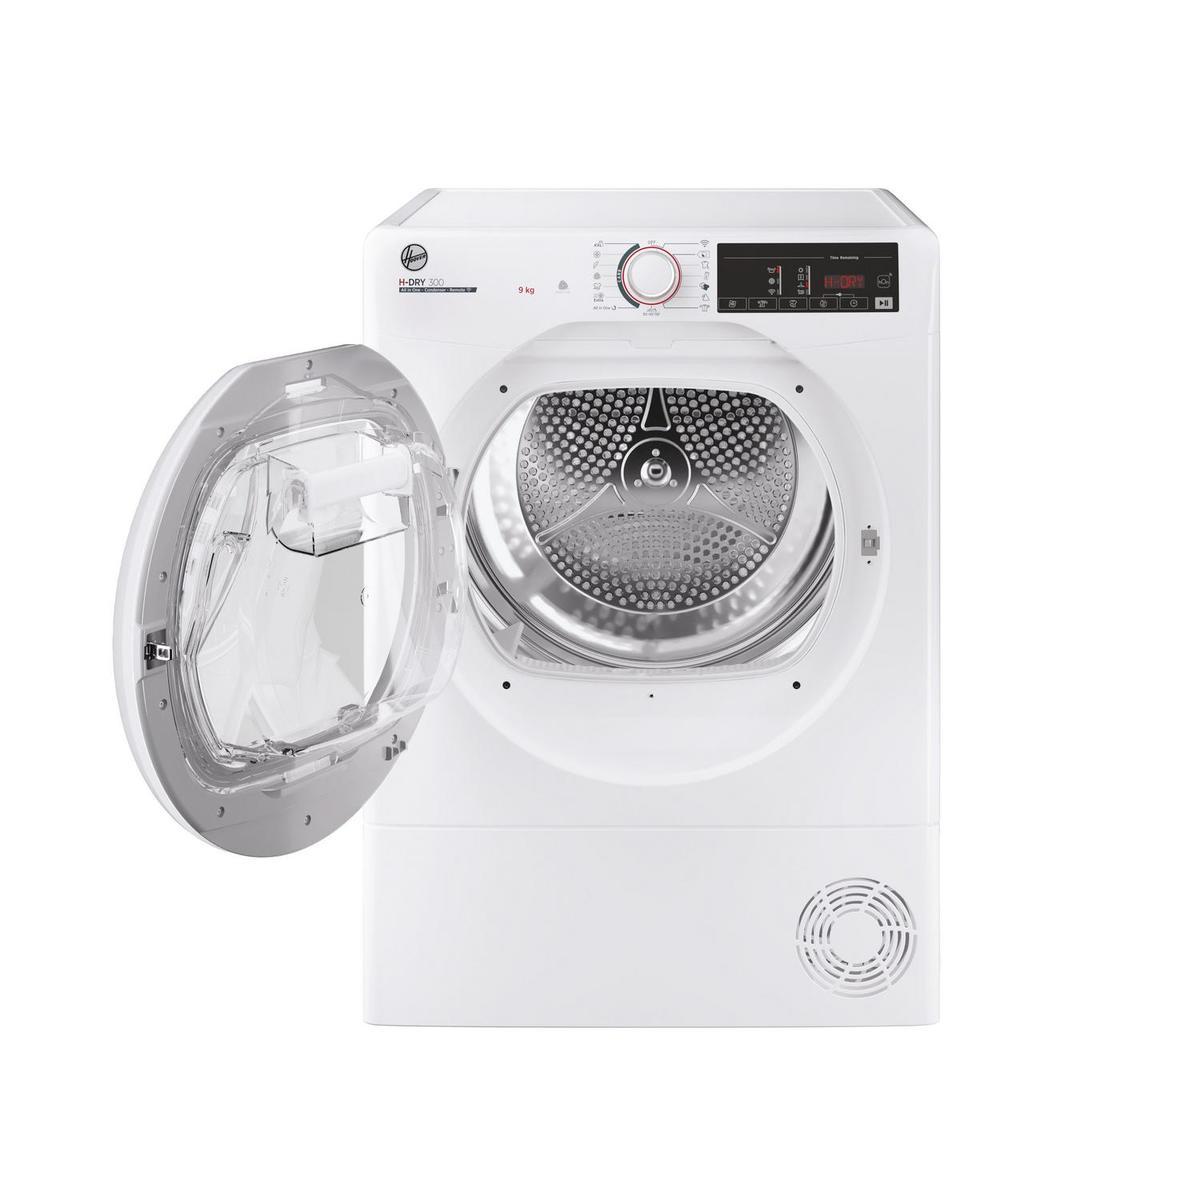 Hoover HLEC9LG 9kg Condenser Tumble Dryer in White